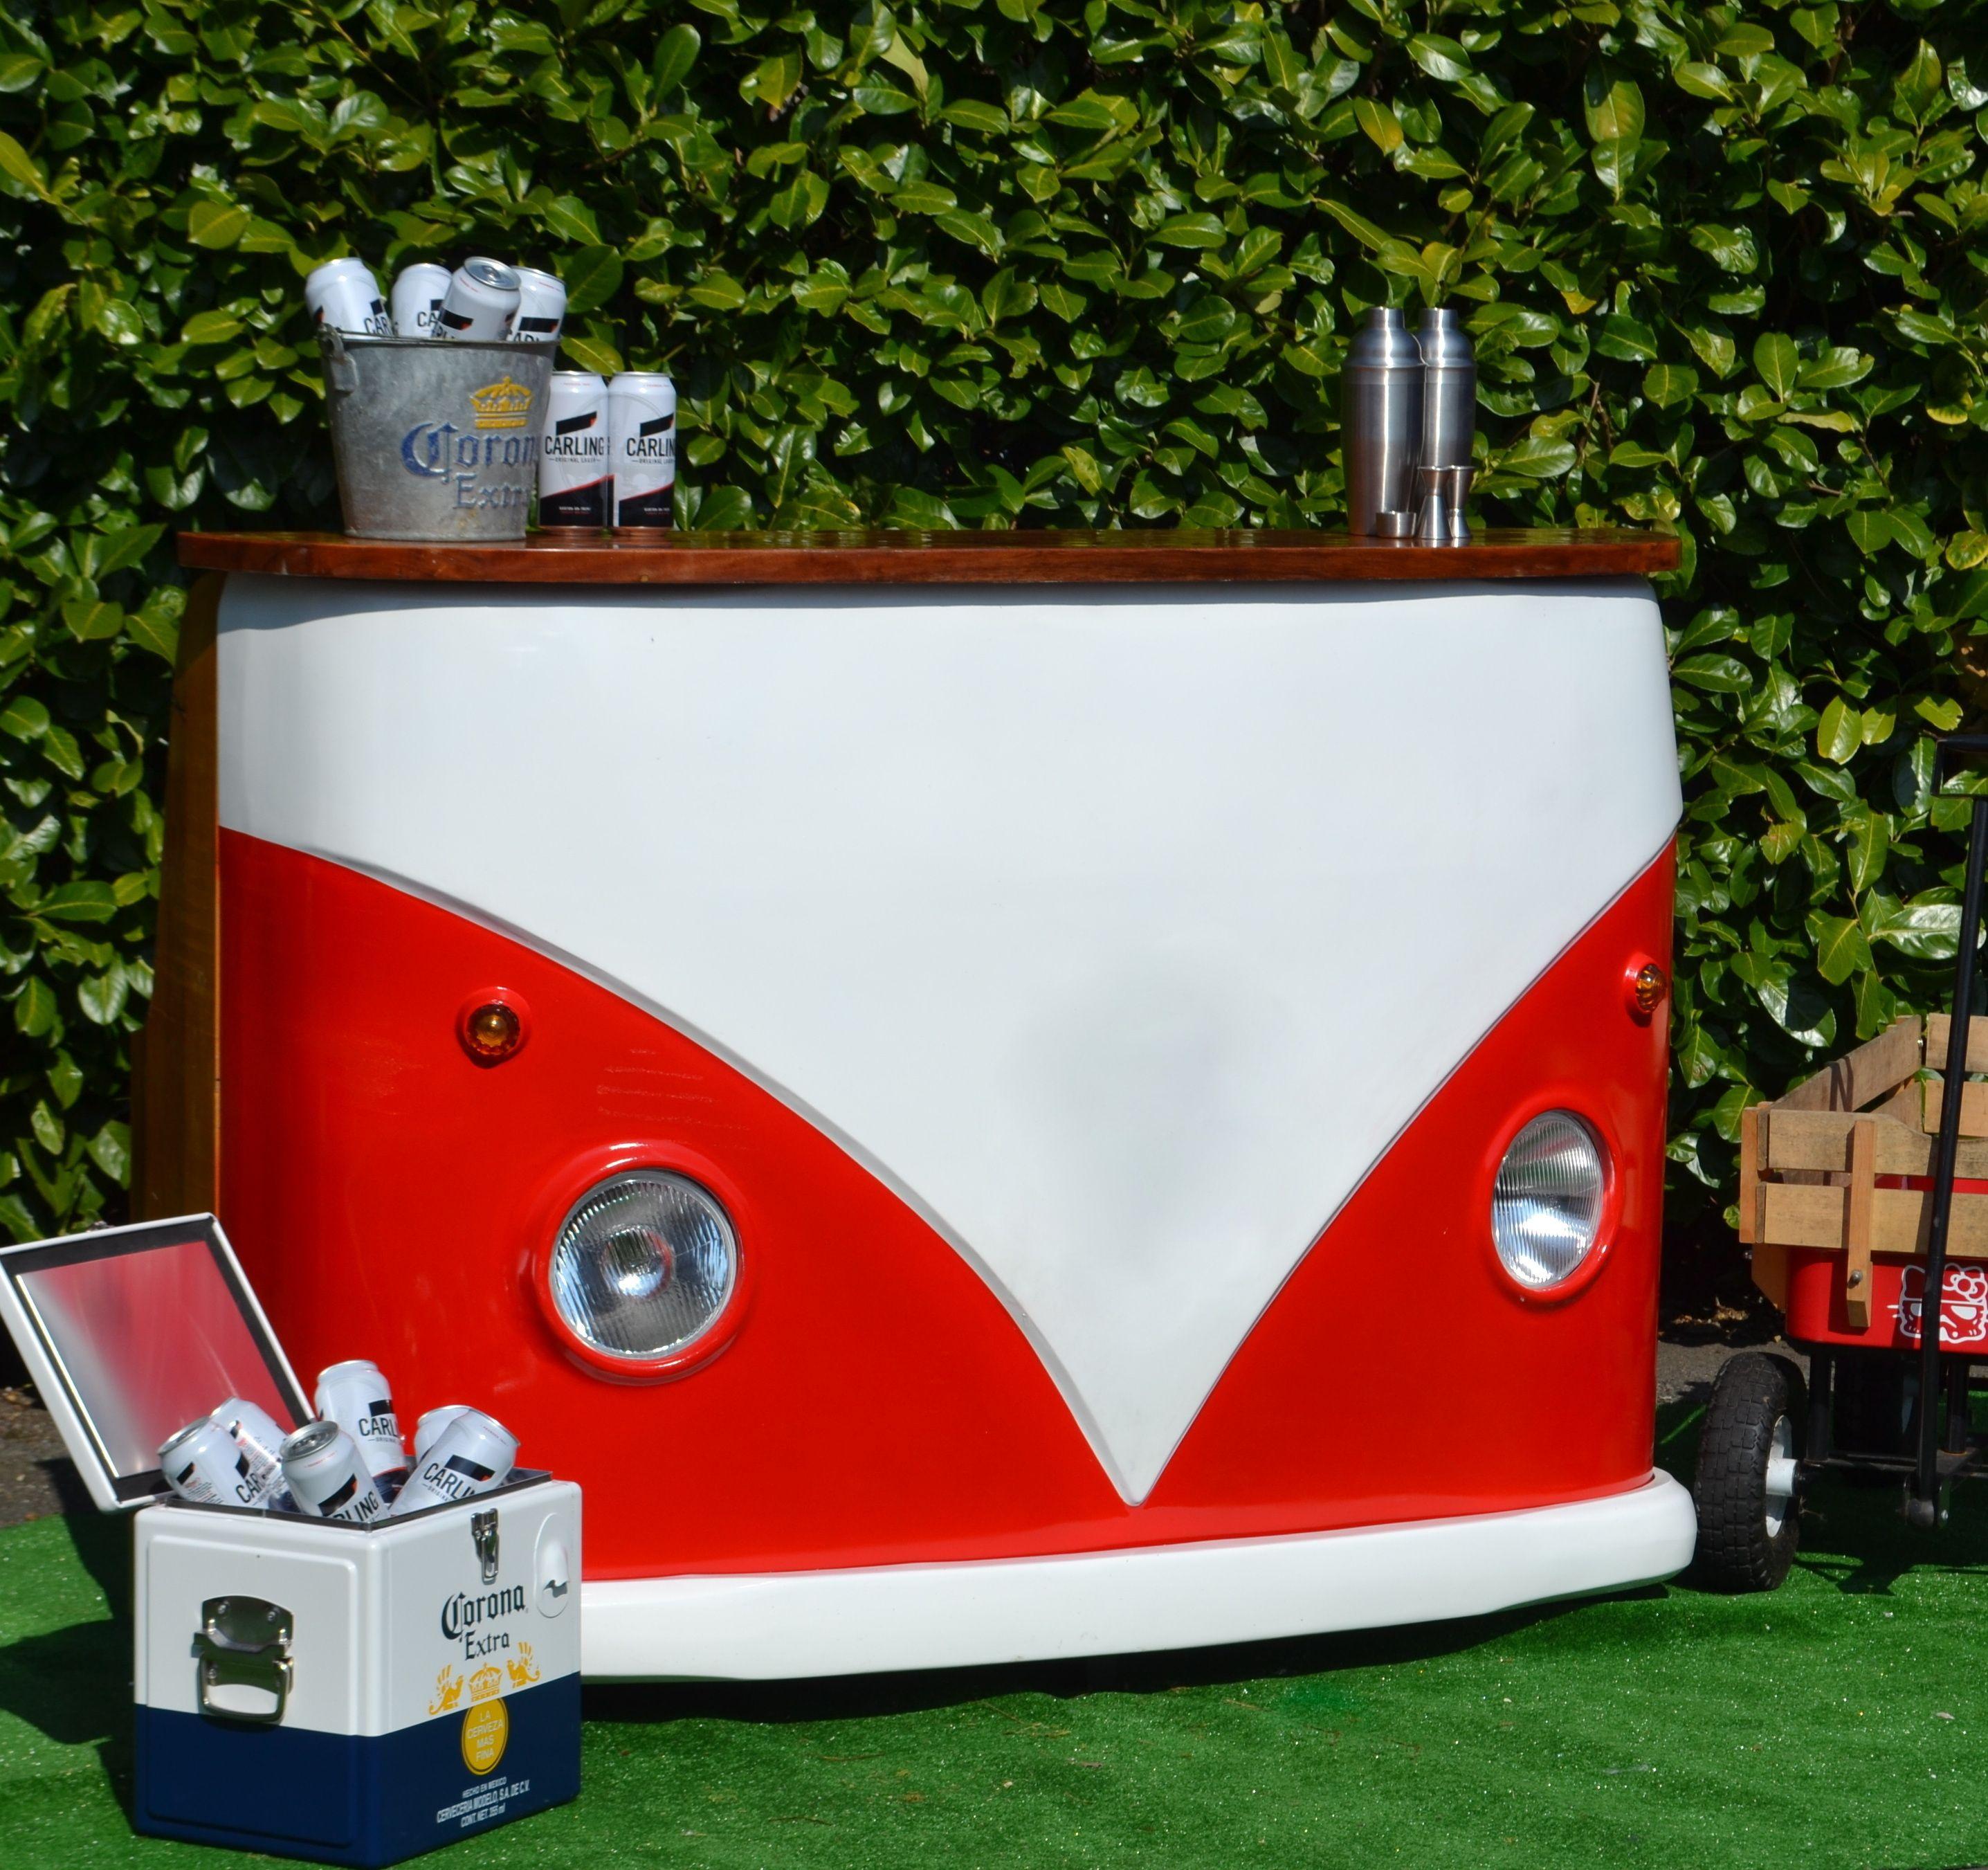 Vw Split Screen Camper Van Drinks Bar Man Cave Camper Van Outdoor Split Screen Ebay In 2020 Vw Campervan Outdoor Bar Bar Drinks